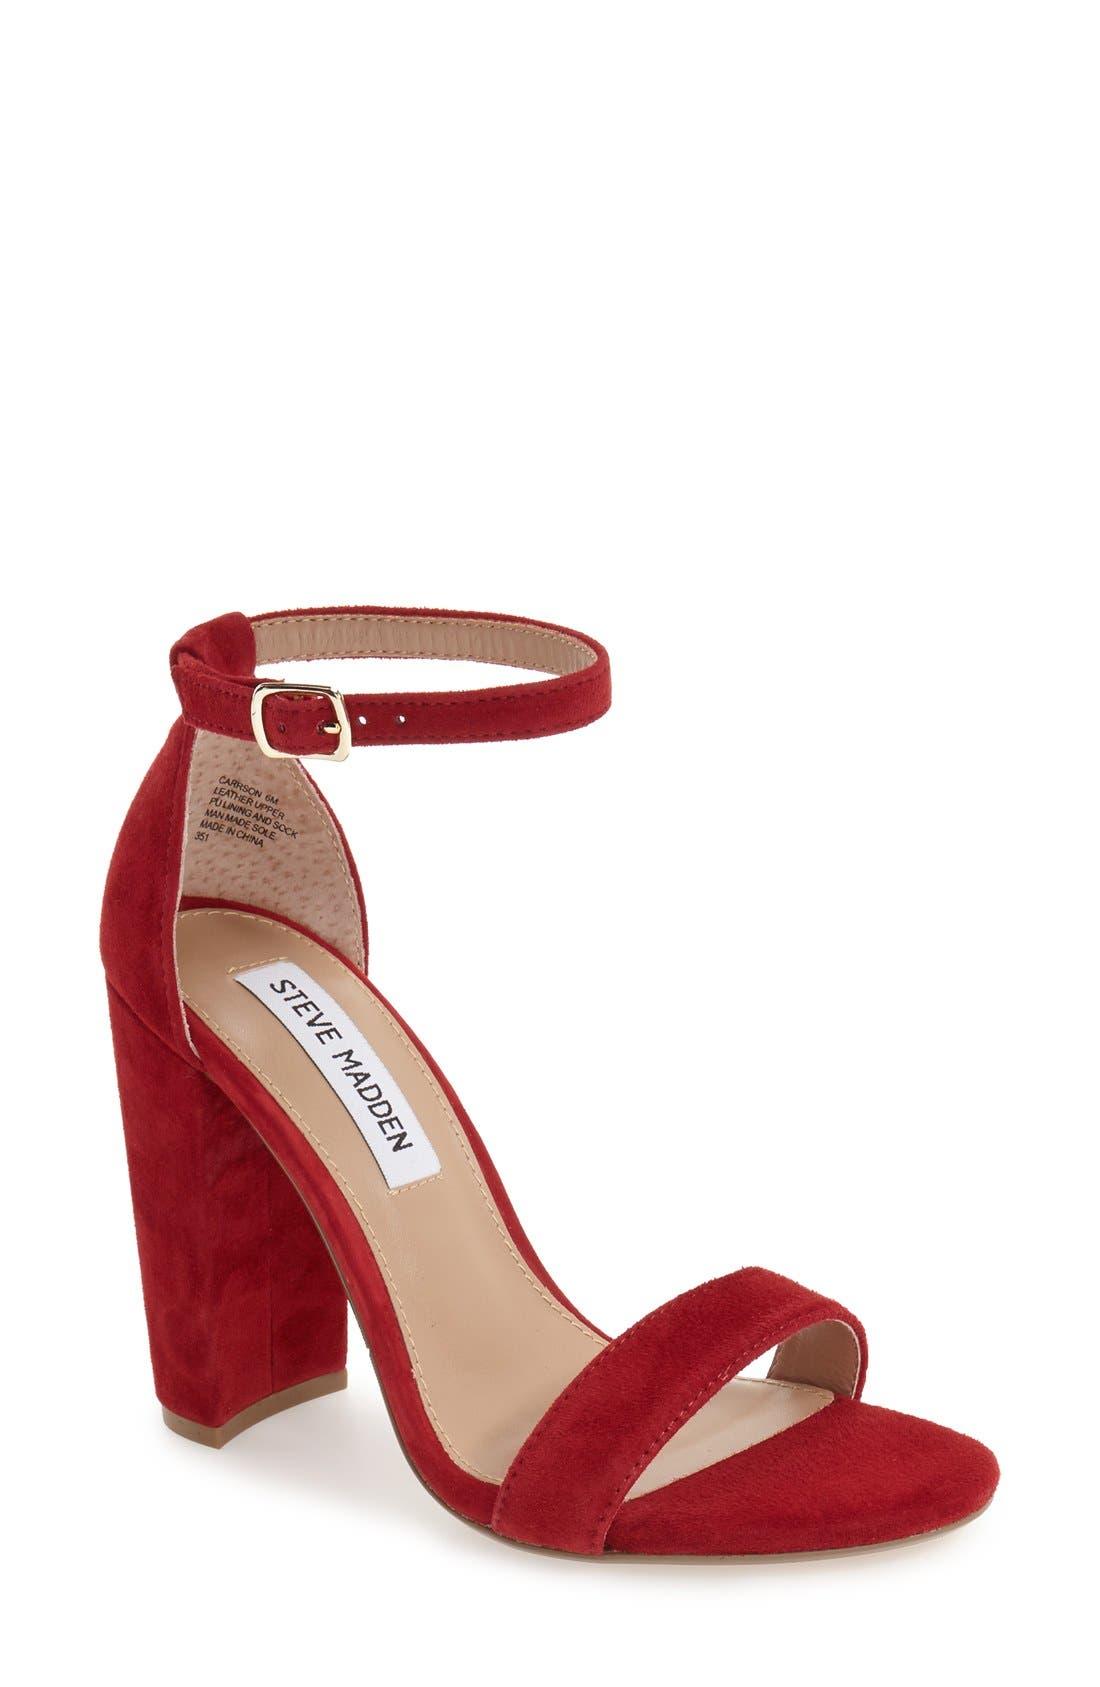 STEVE MADDEN Carrson Sandal, Main, color, DARK RED SUEDE